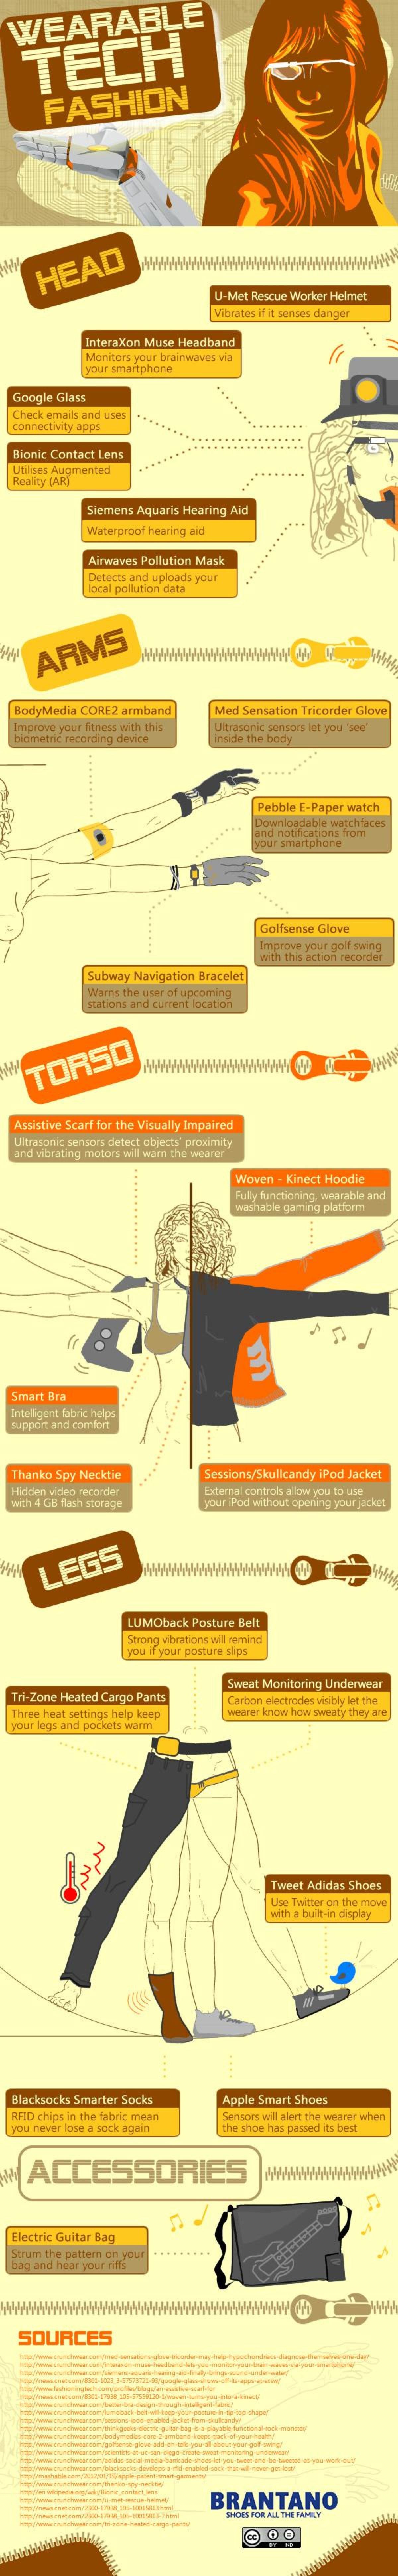 Wearable-Tech-Fashion-Infographic